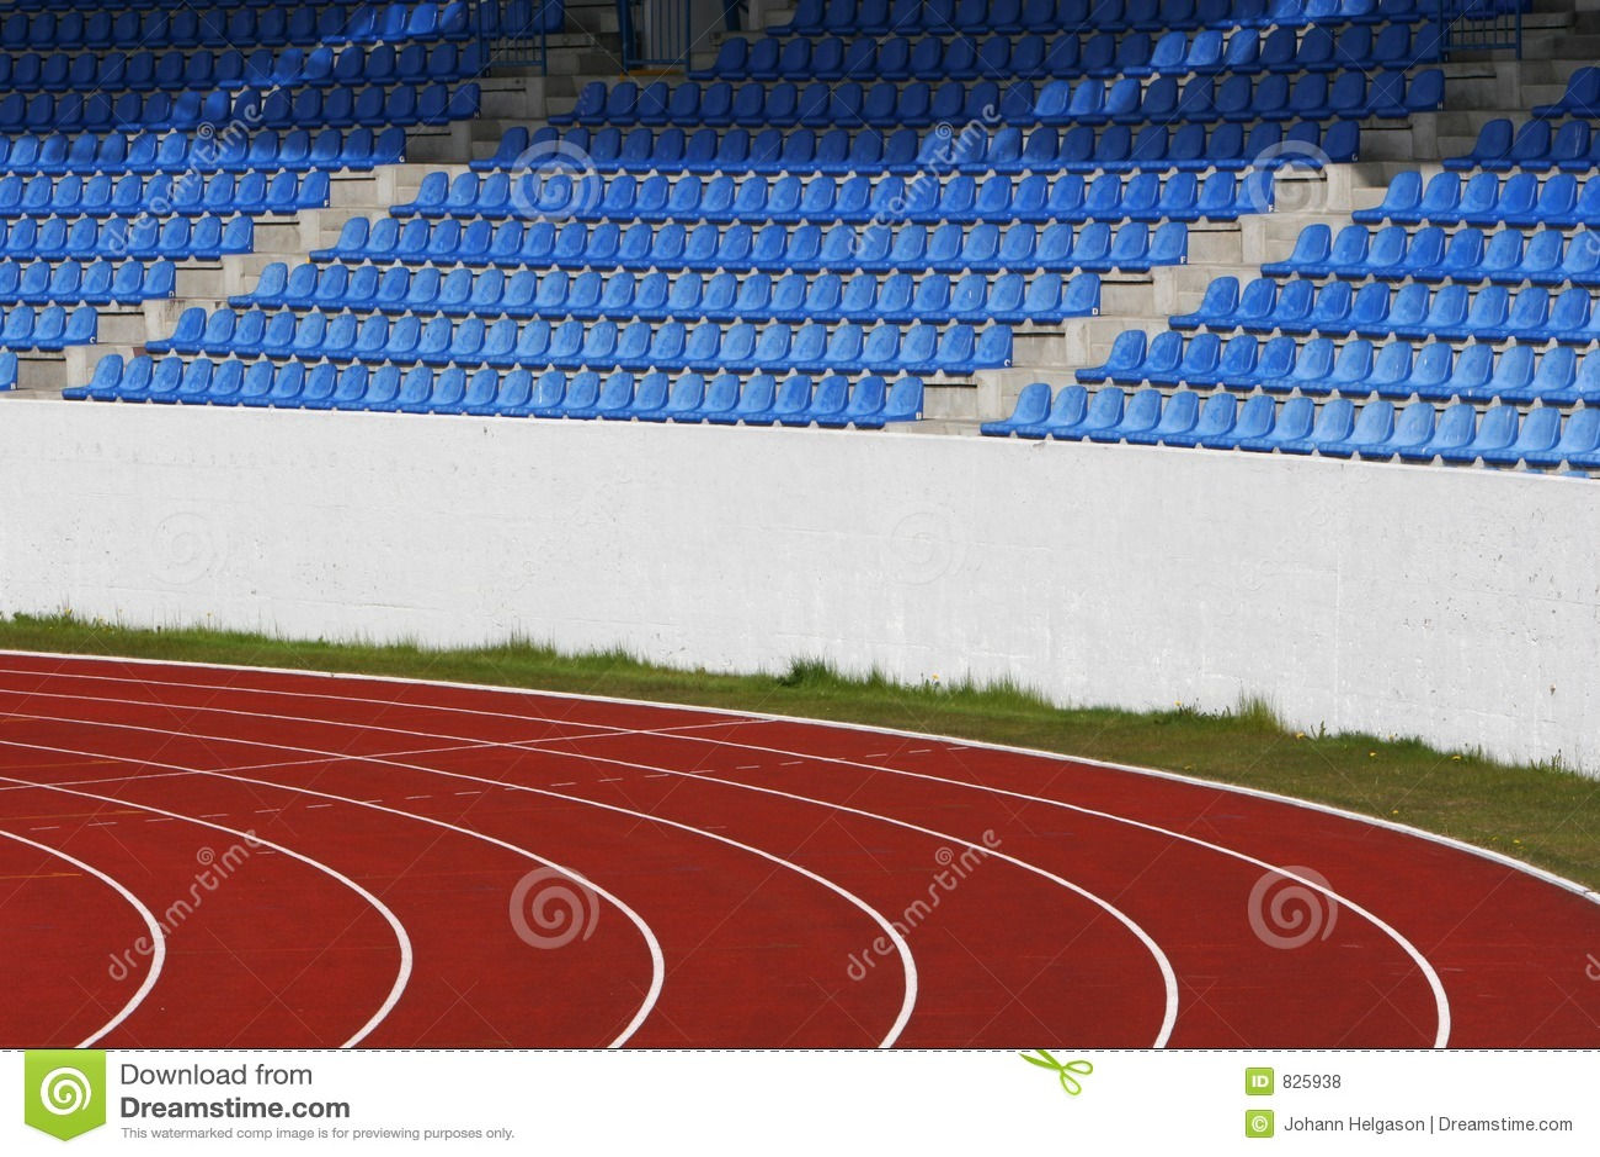 Tracks and seats